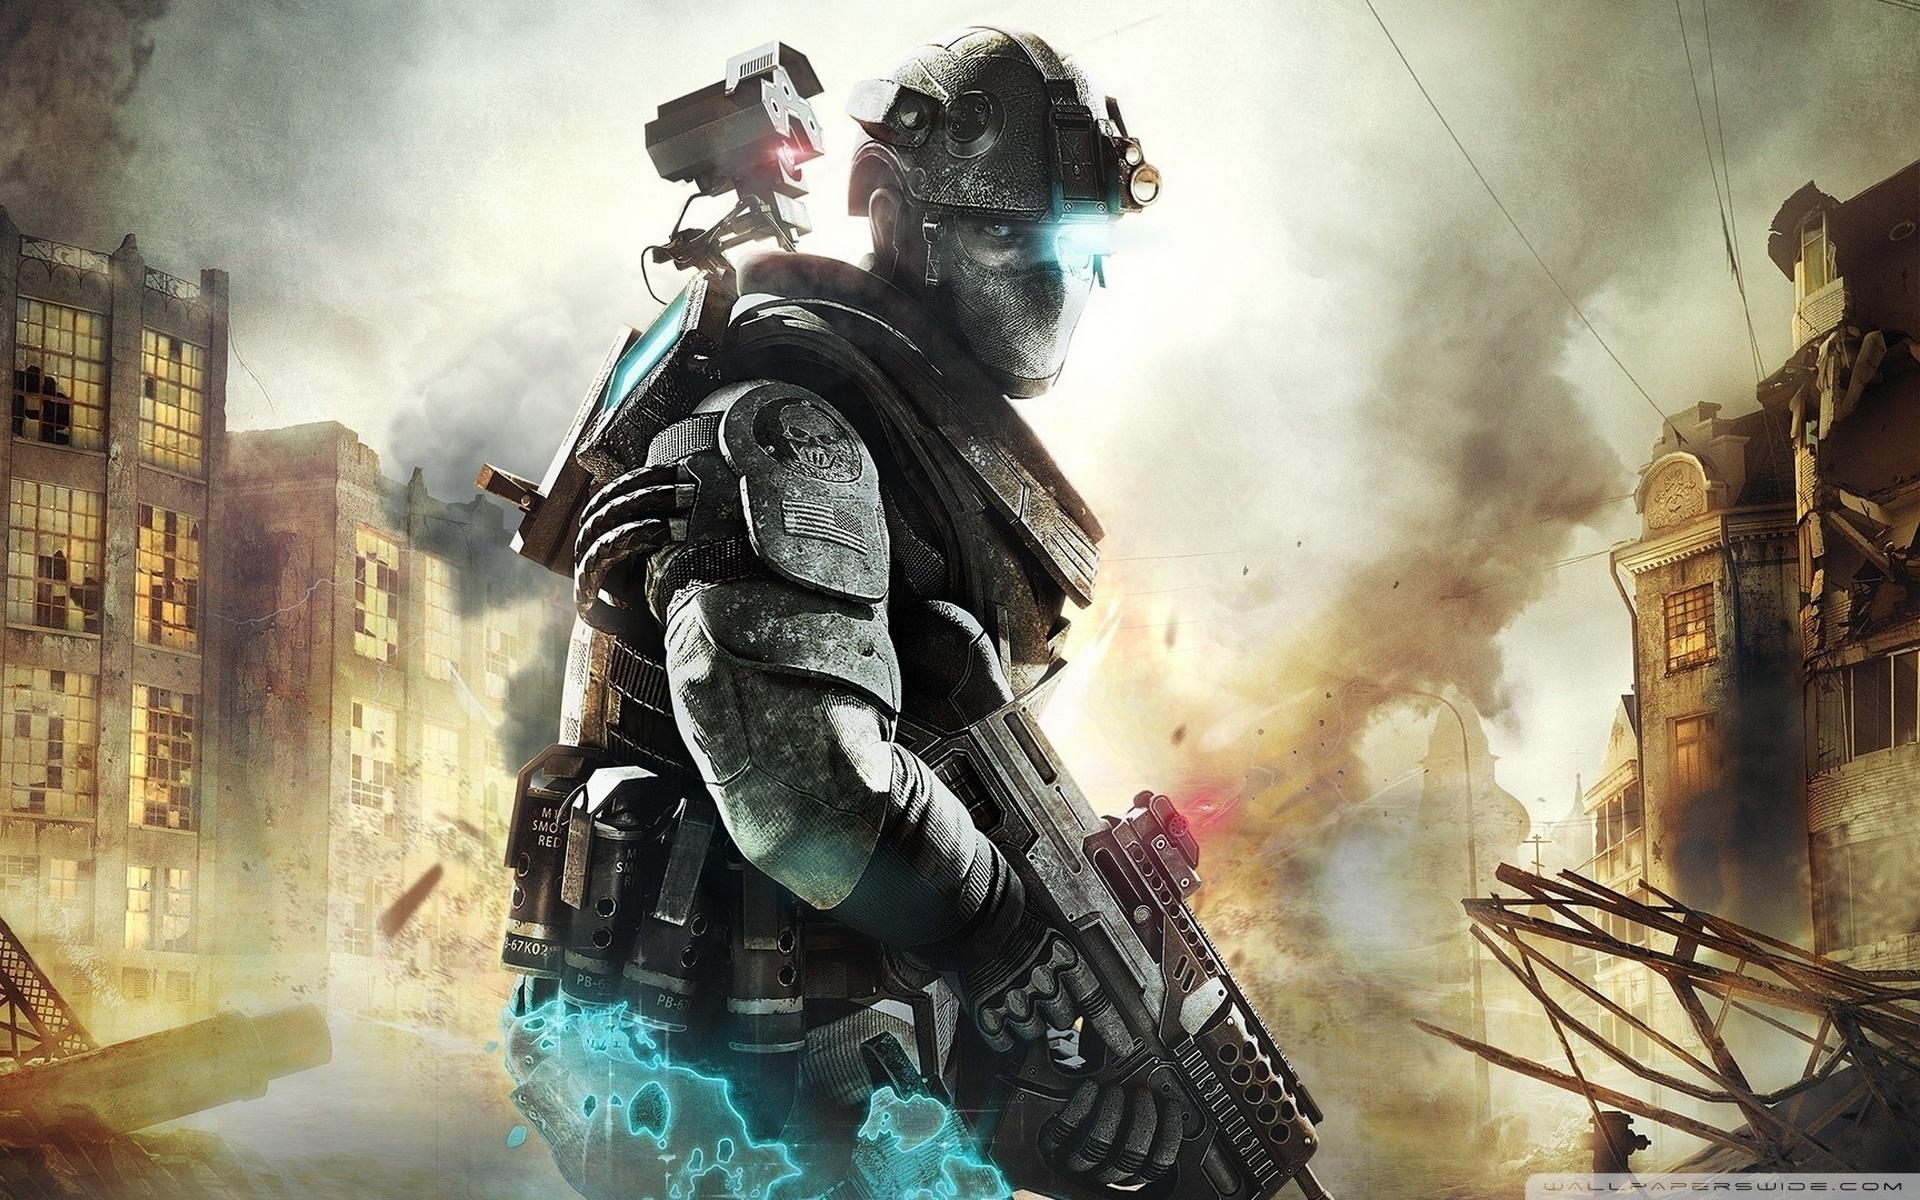 tom clancy's ghost recon: future soldier ❤ 4k hd desktop wallpaper